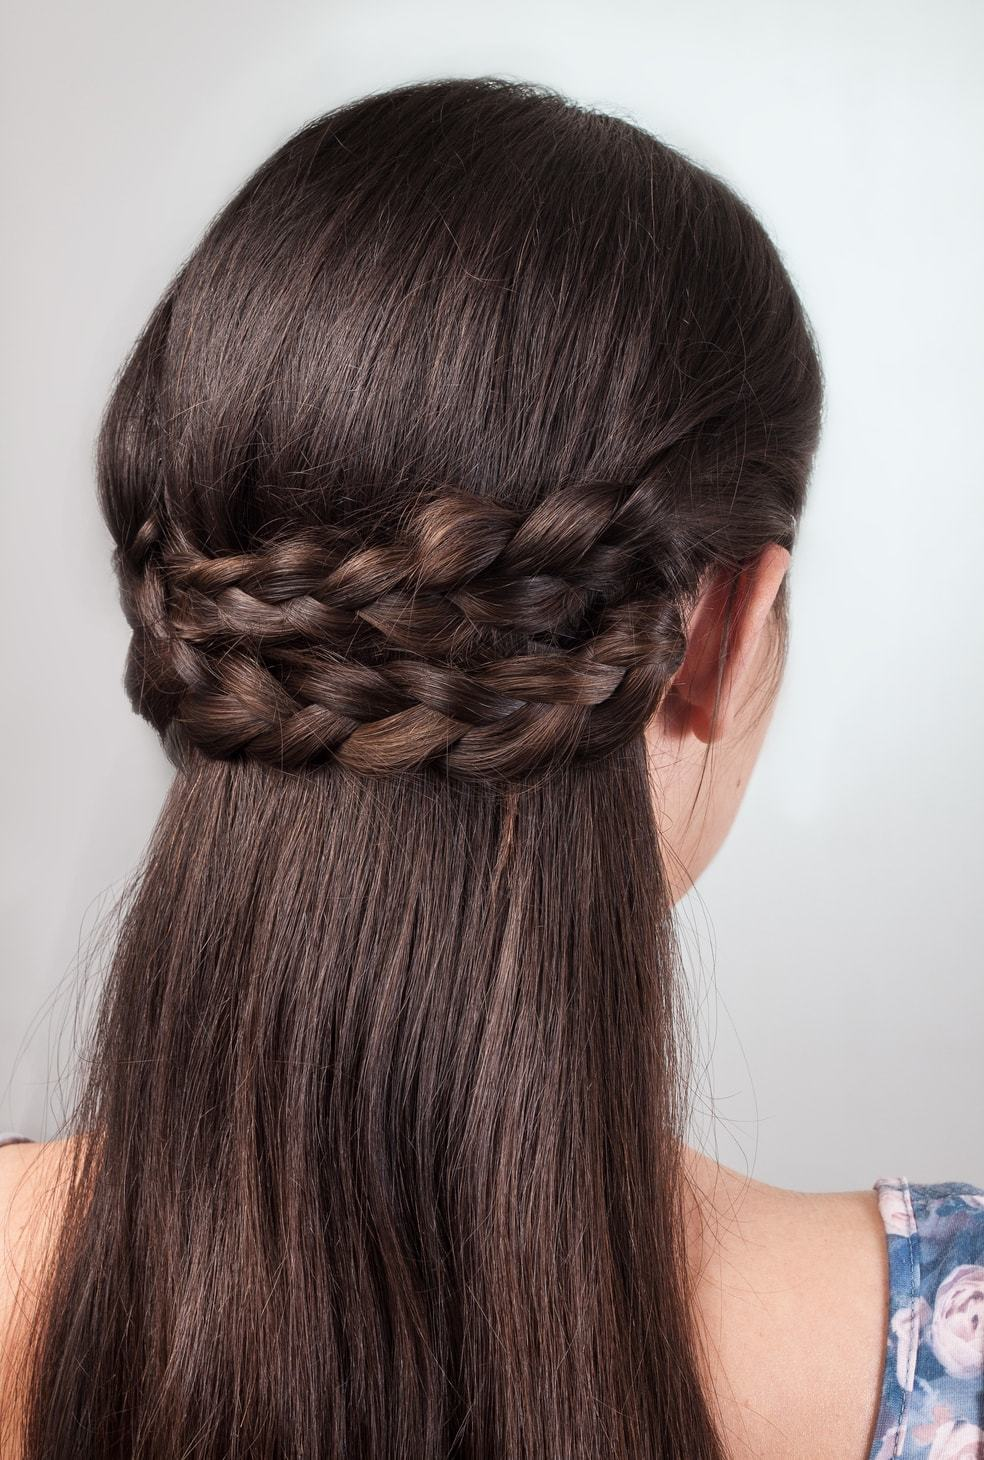 flower girl hairstyles braided half updo